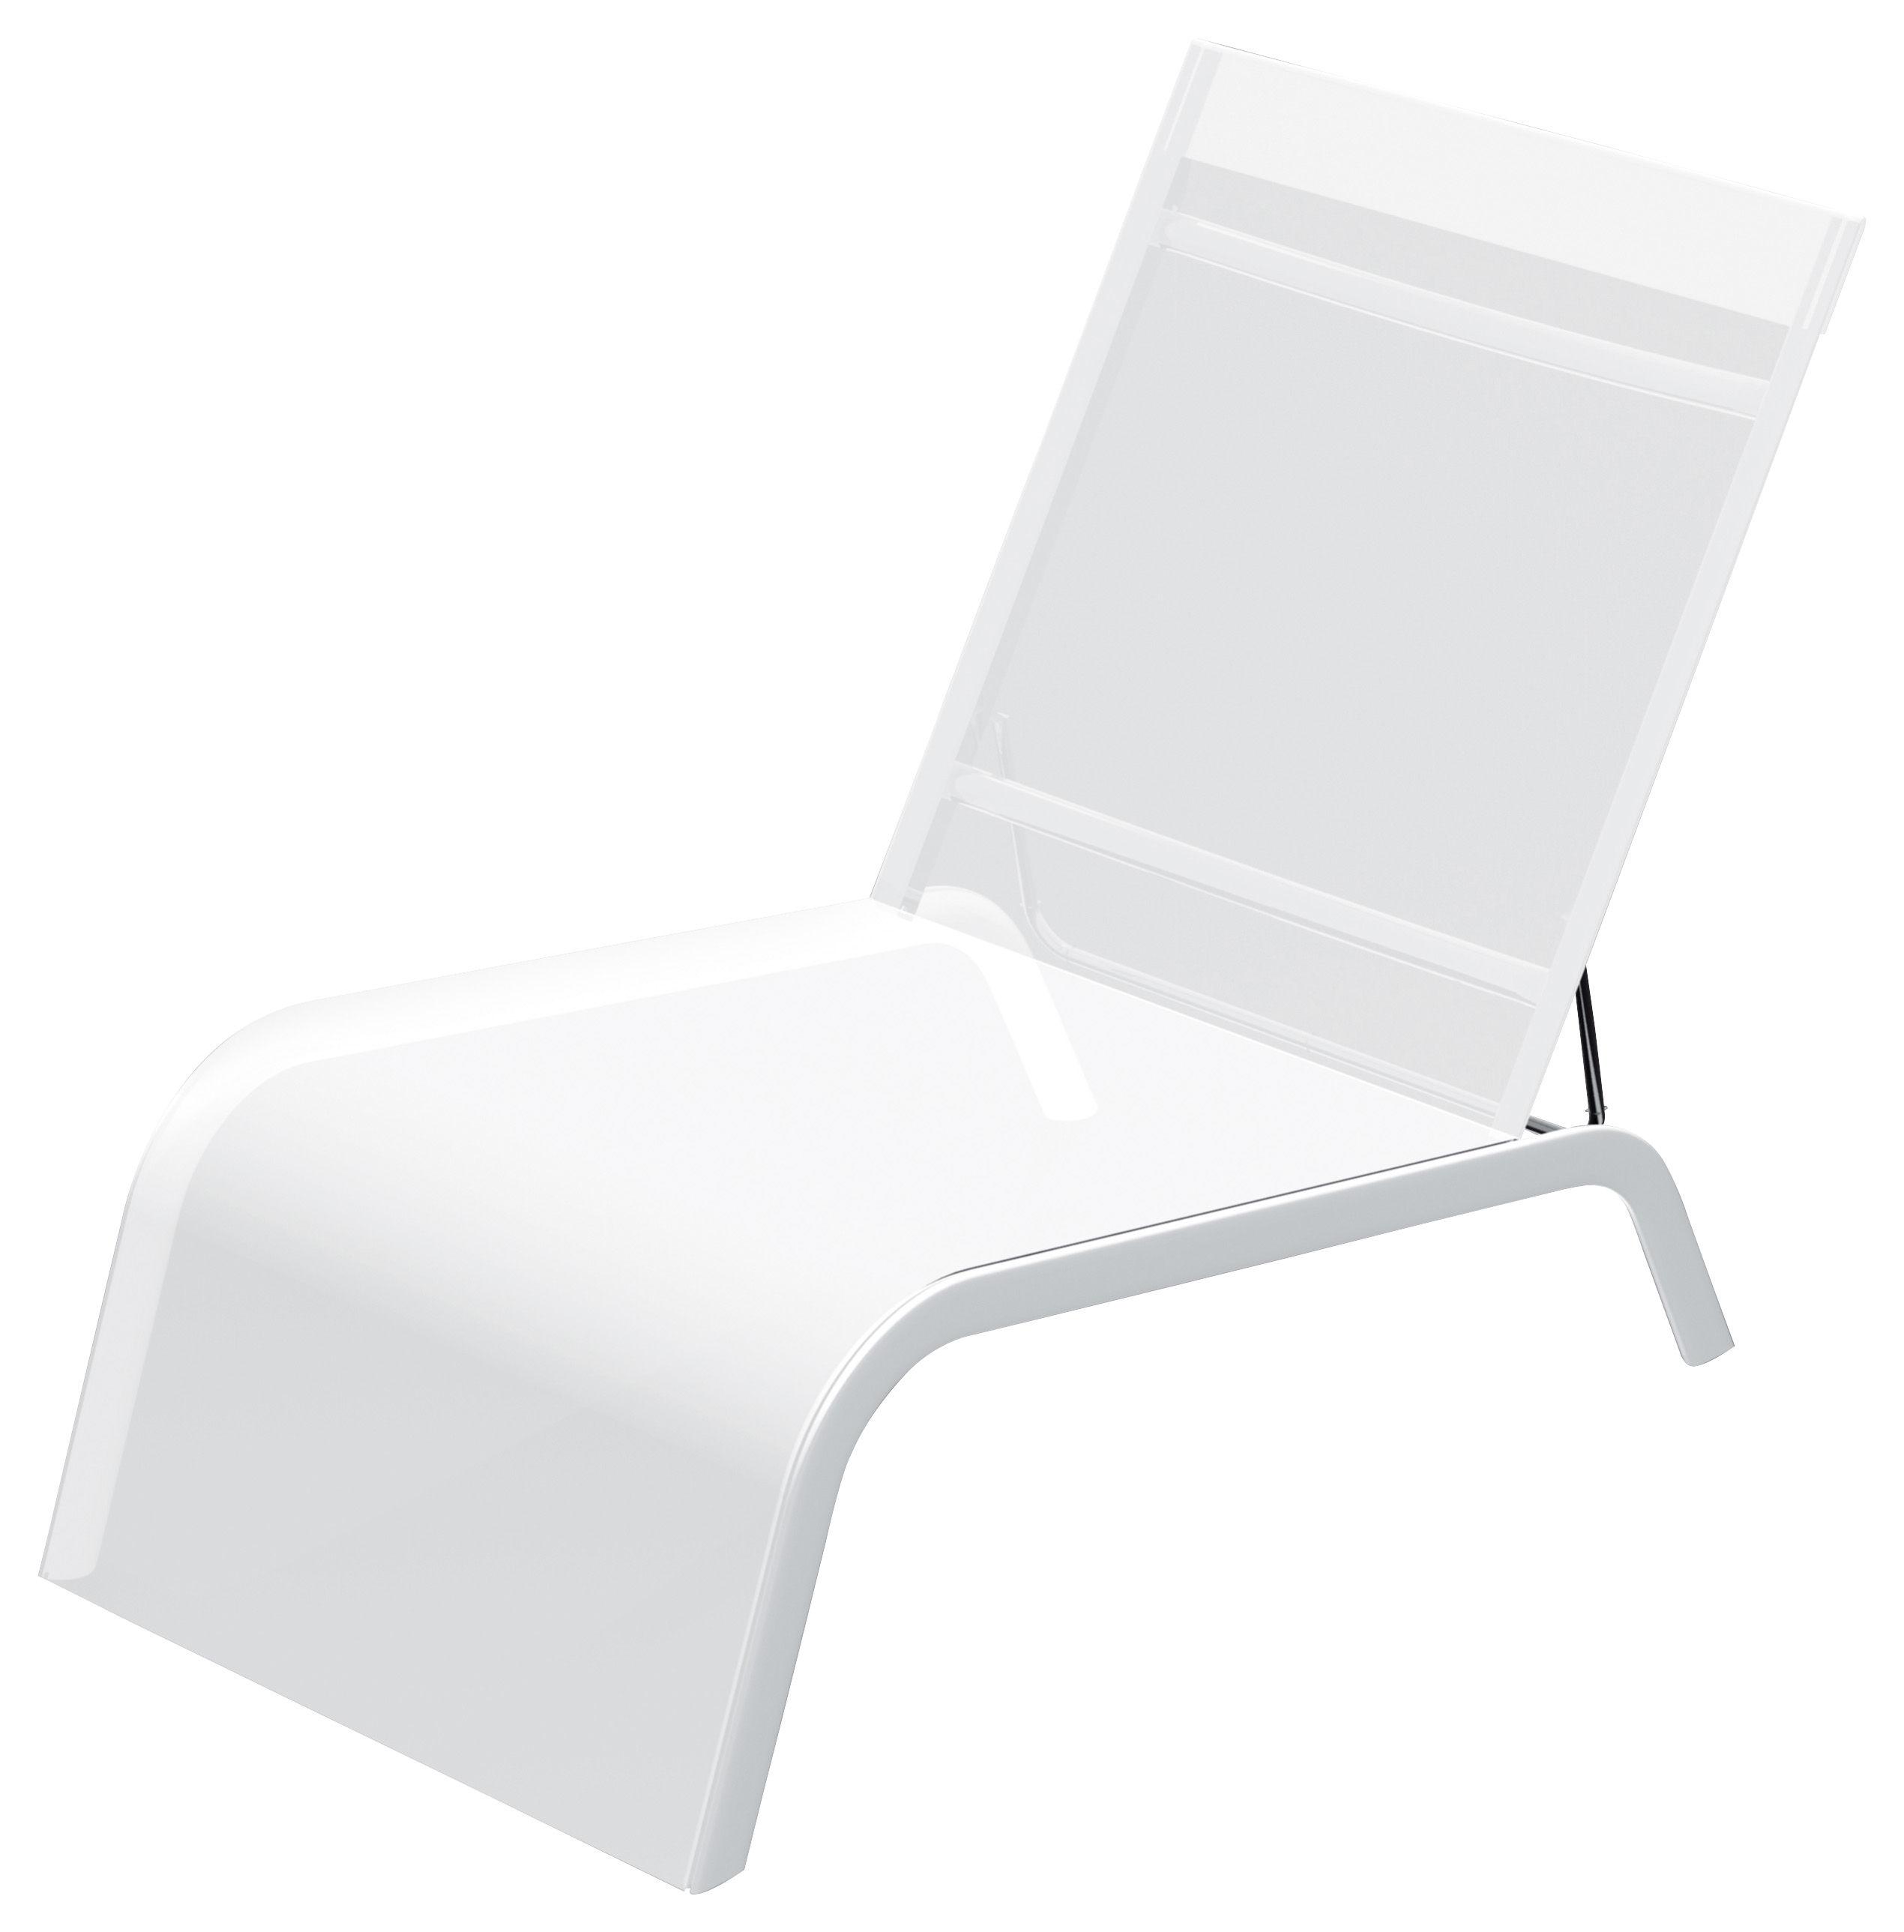 Outdoor - Chaises longues et hamacs - Fauteuil bas Lazy Yacht - Serralunga - Blanc - Aluminium, Toile Batyline